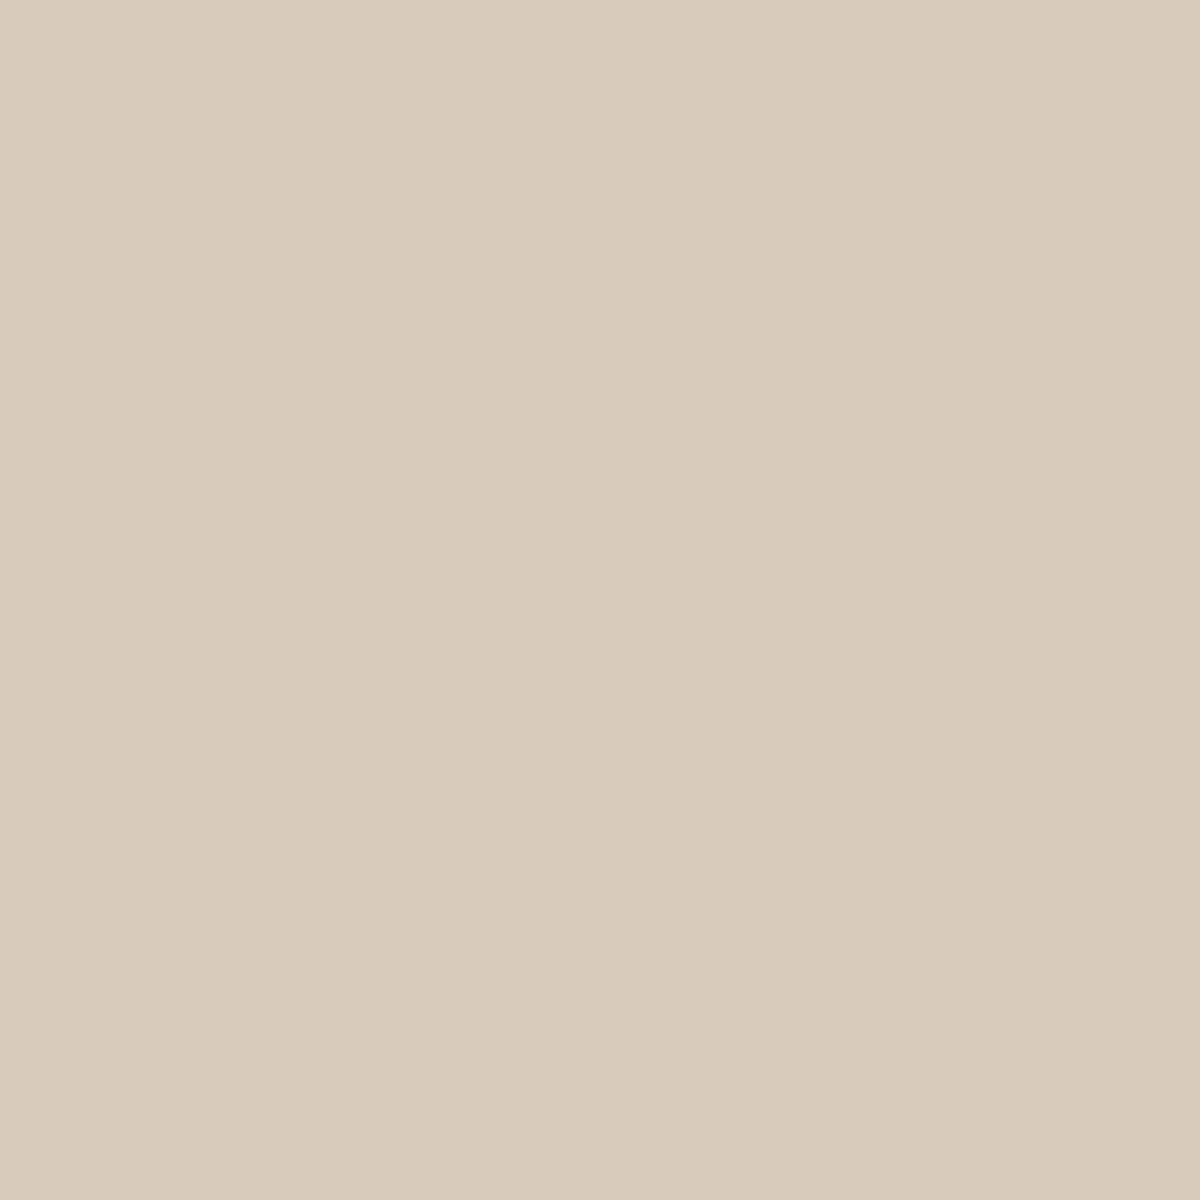 C120-Ash Confetti Cottons Color Rose Garden Gerri Robinson